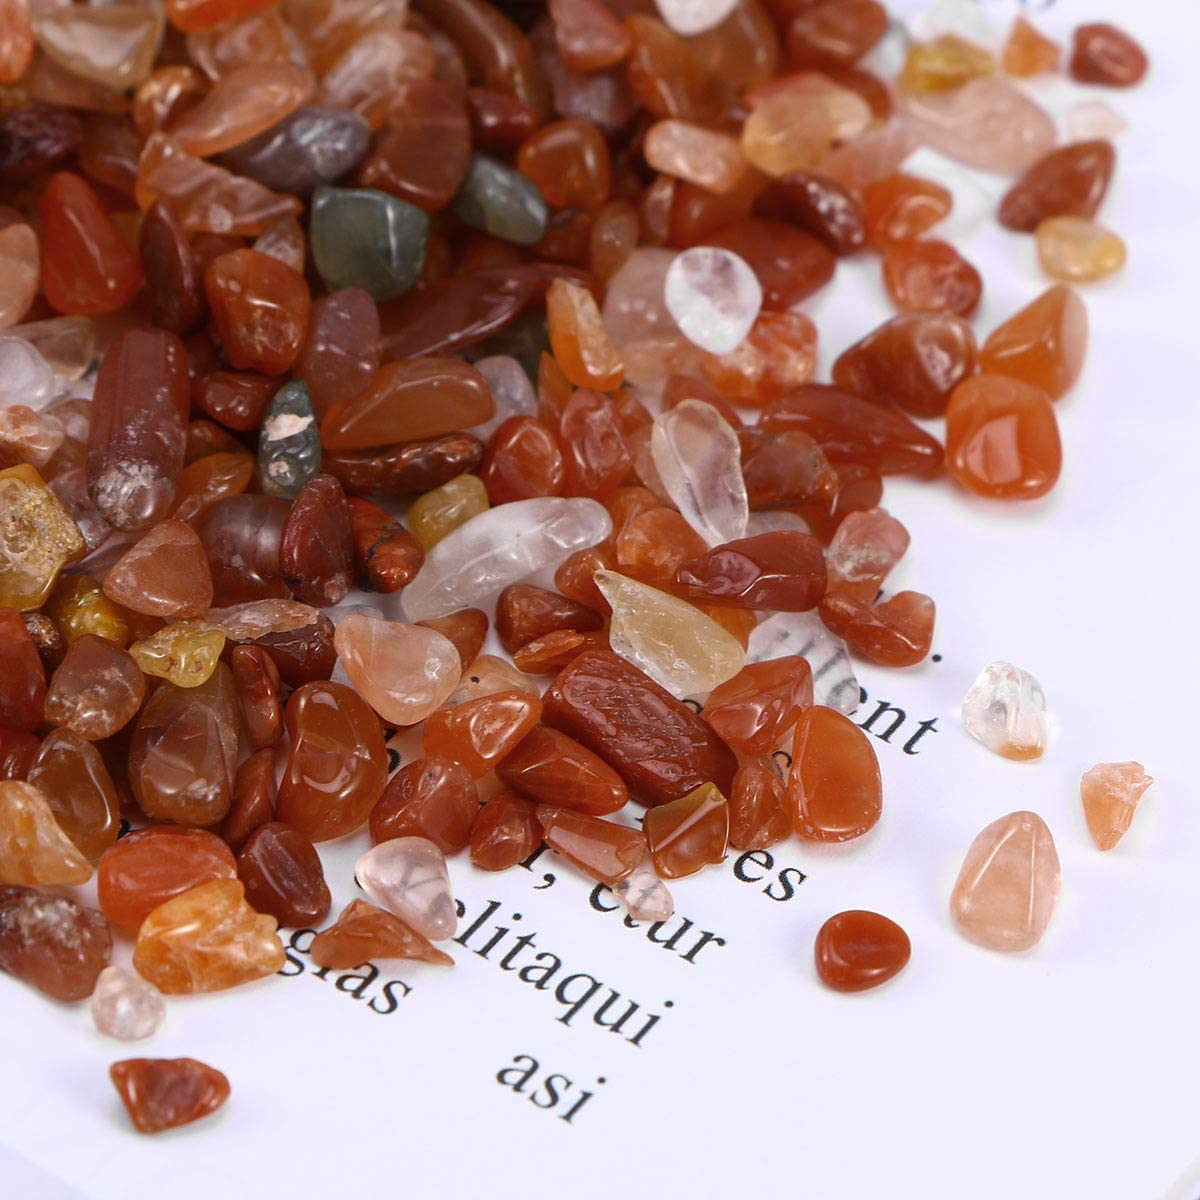 Red POPETPOP 100g Aquarium Gravel River Rock Decorative Polished Gravel Small Decorative Pebbles Stones for Aquariums Landscaping Vase Fillers